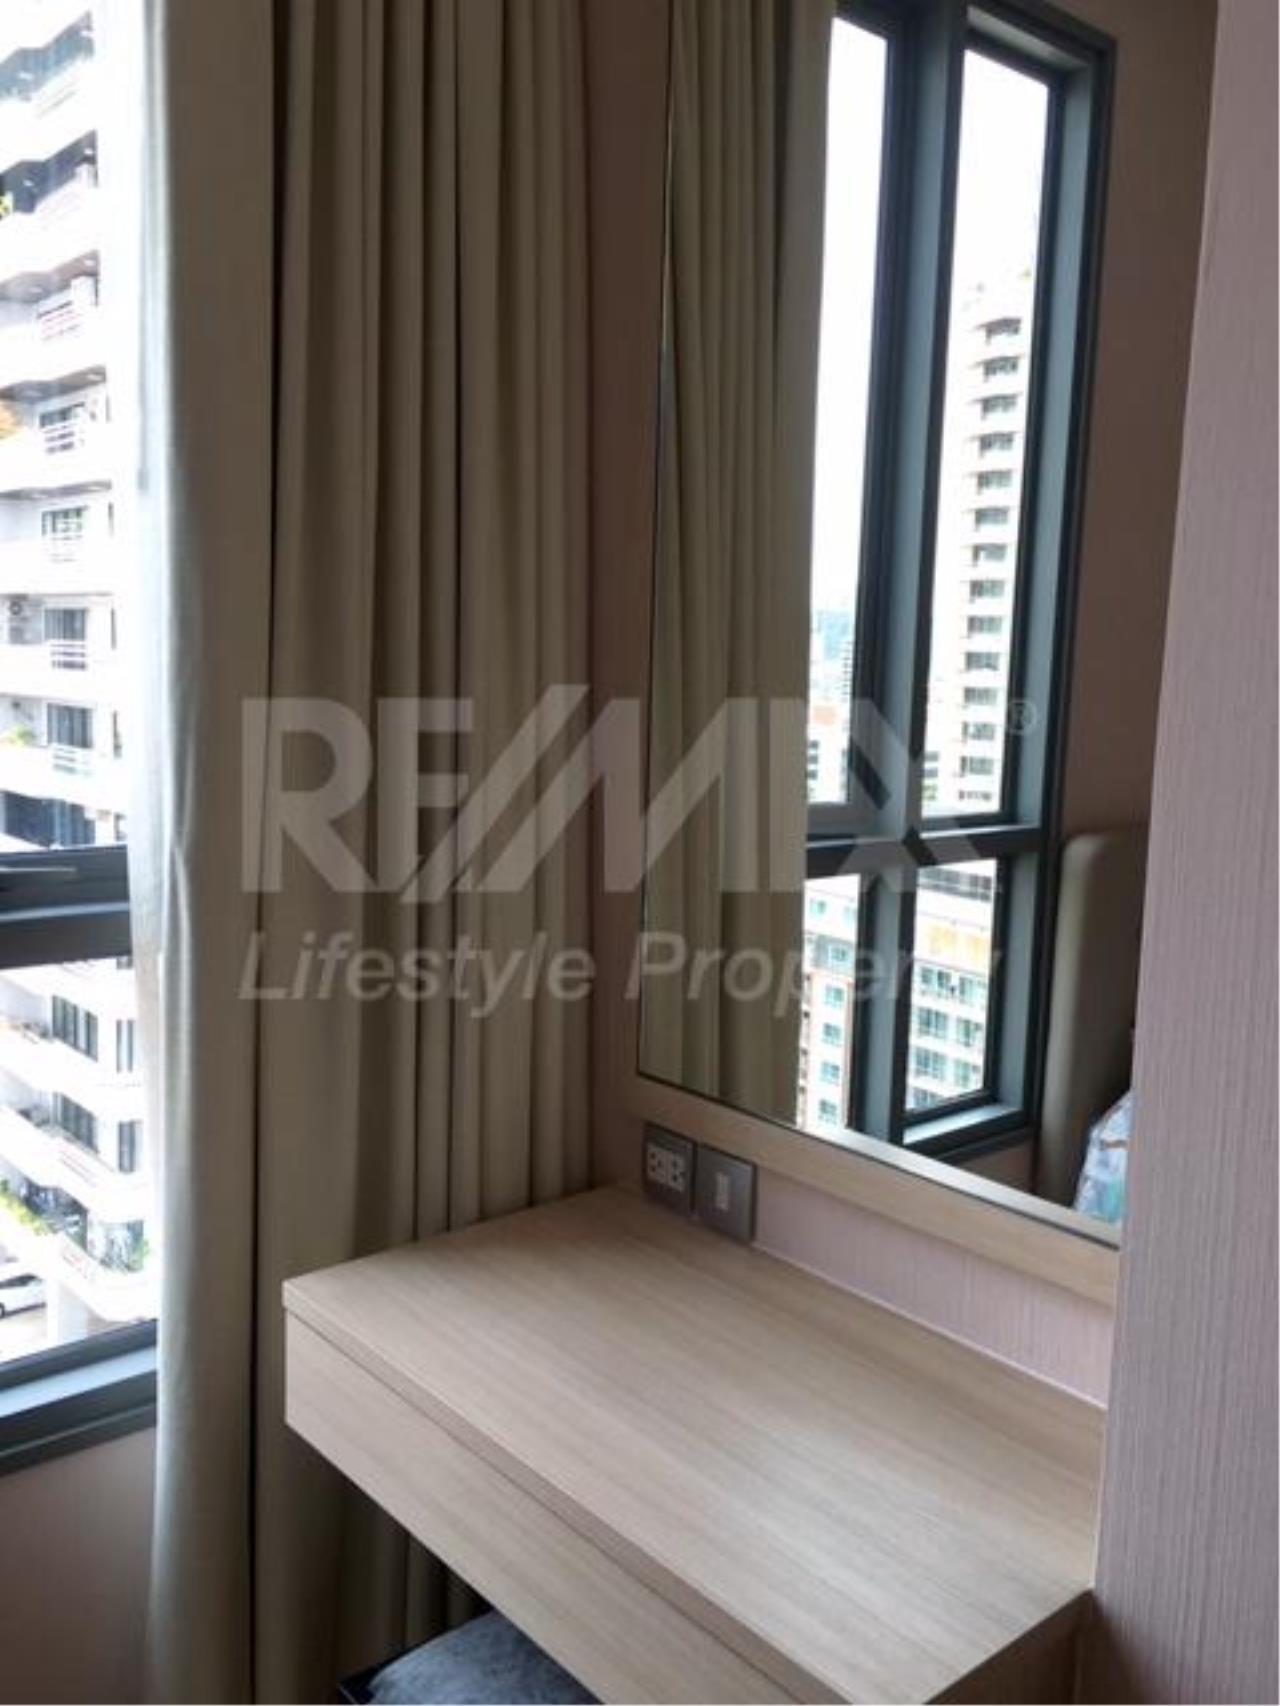 RE/MAX LifeStyle Property Agency's H Sukhumvit 43 3